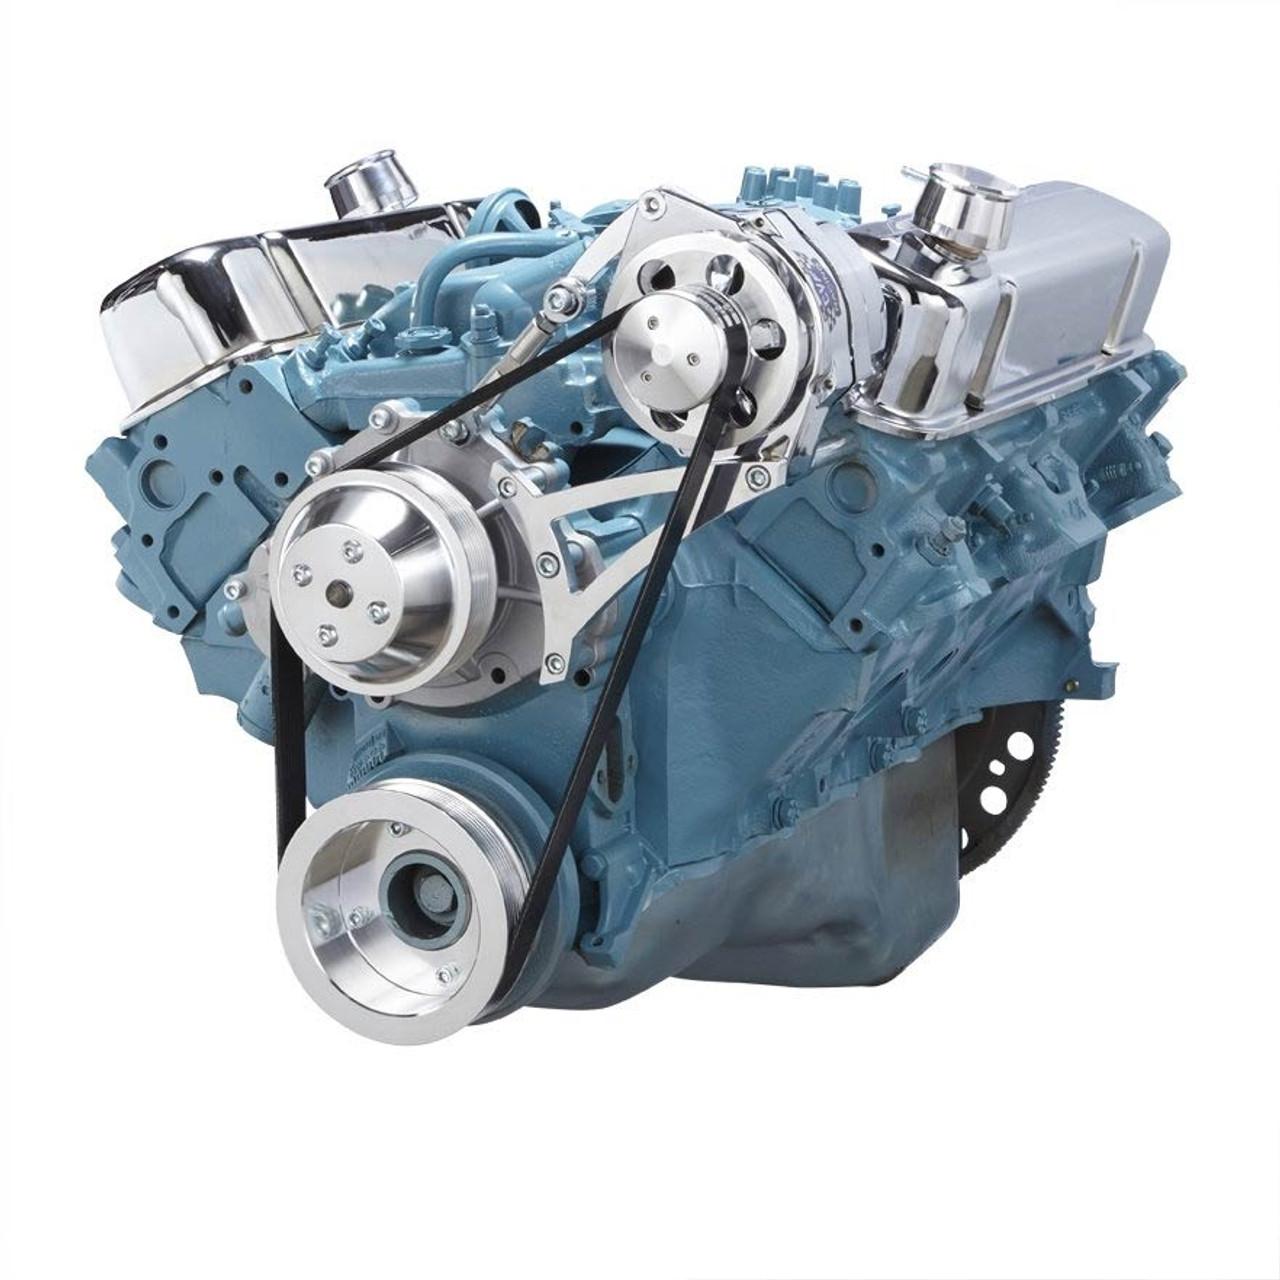 Pontiac Serpentine Conversion Kit (350-400, 428 & 455) for ...